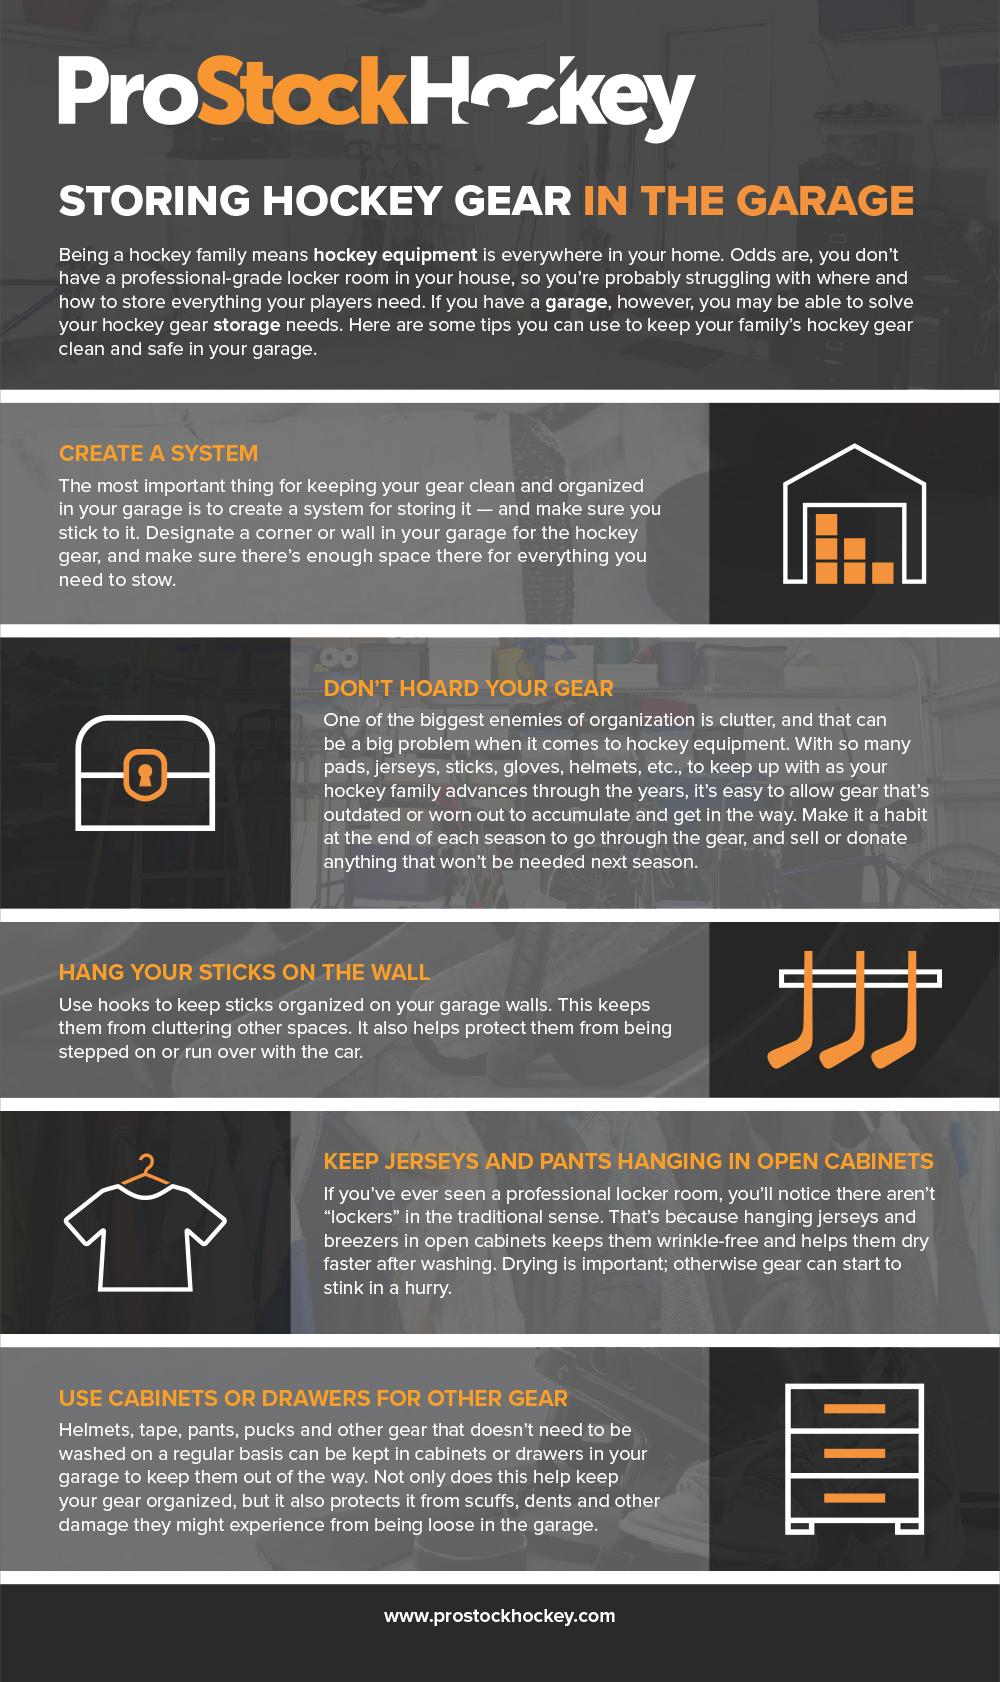 Infographic courtesy of  Pro Stock Hockey